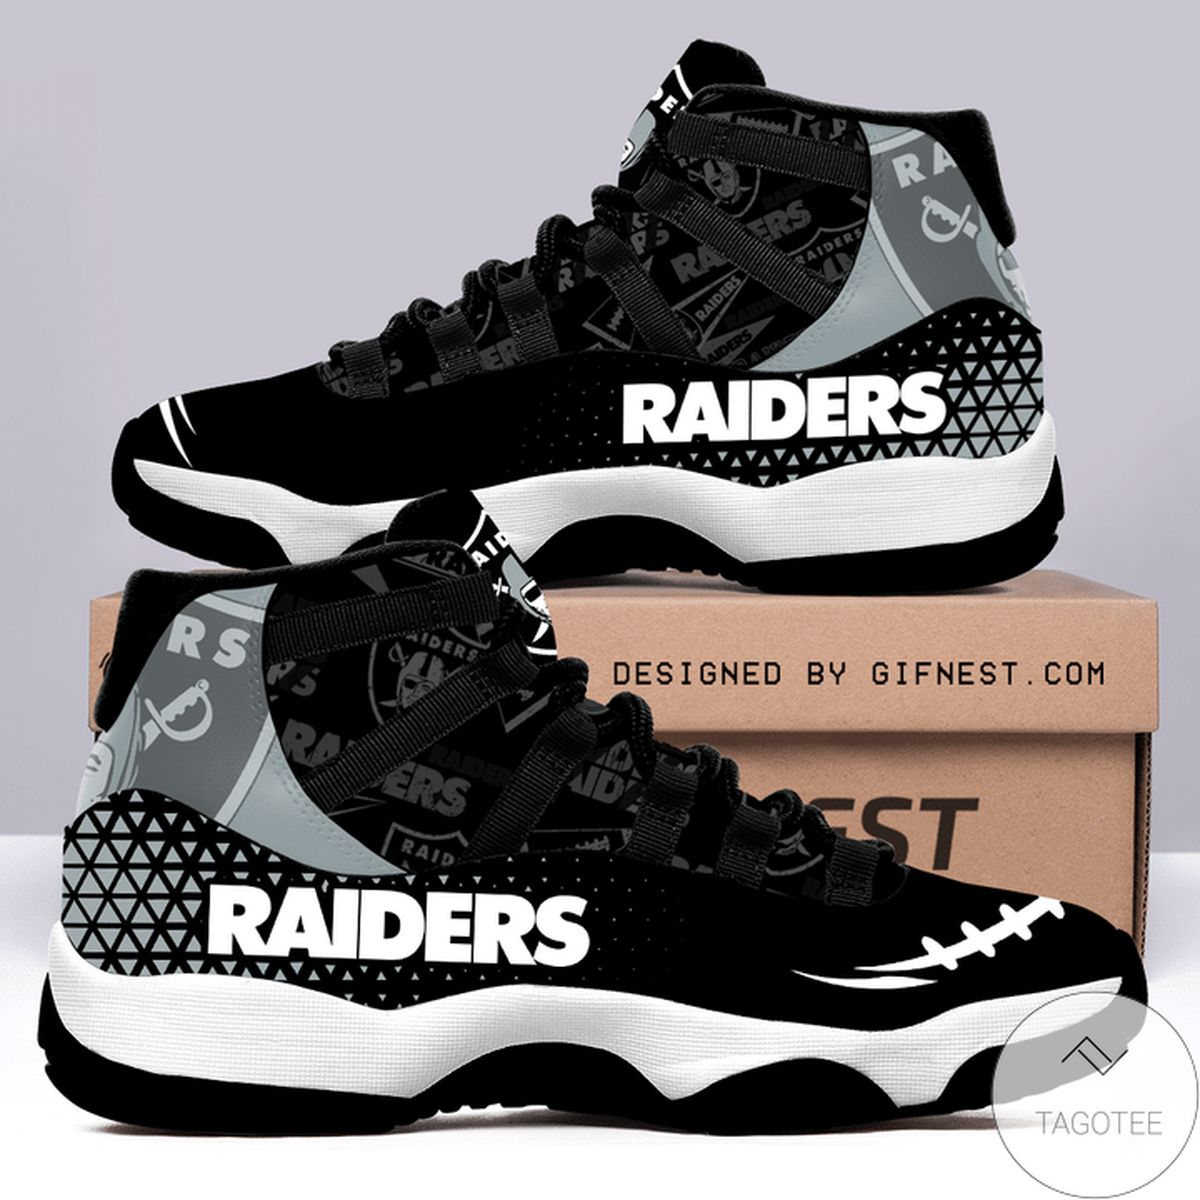 Las Vegas Raiders Air Jordan 11 Shoes